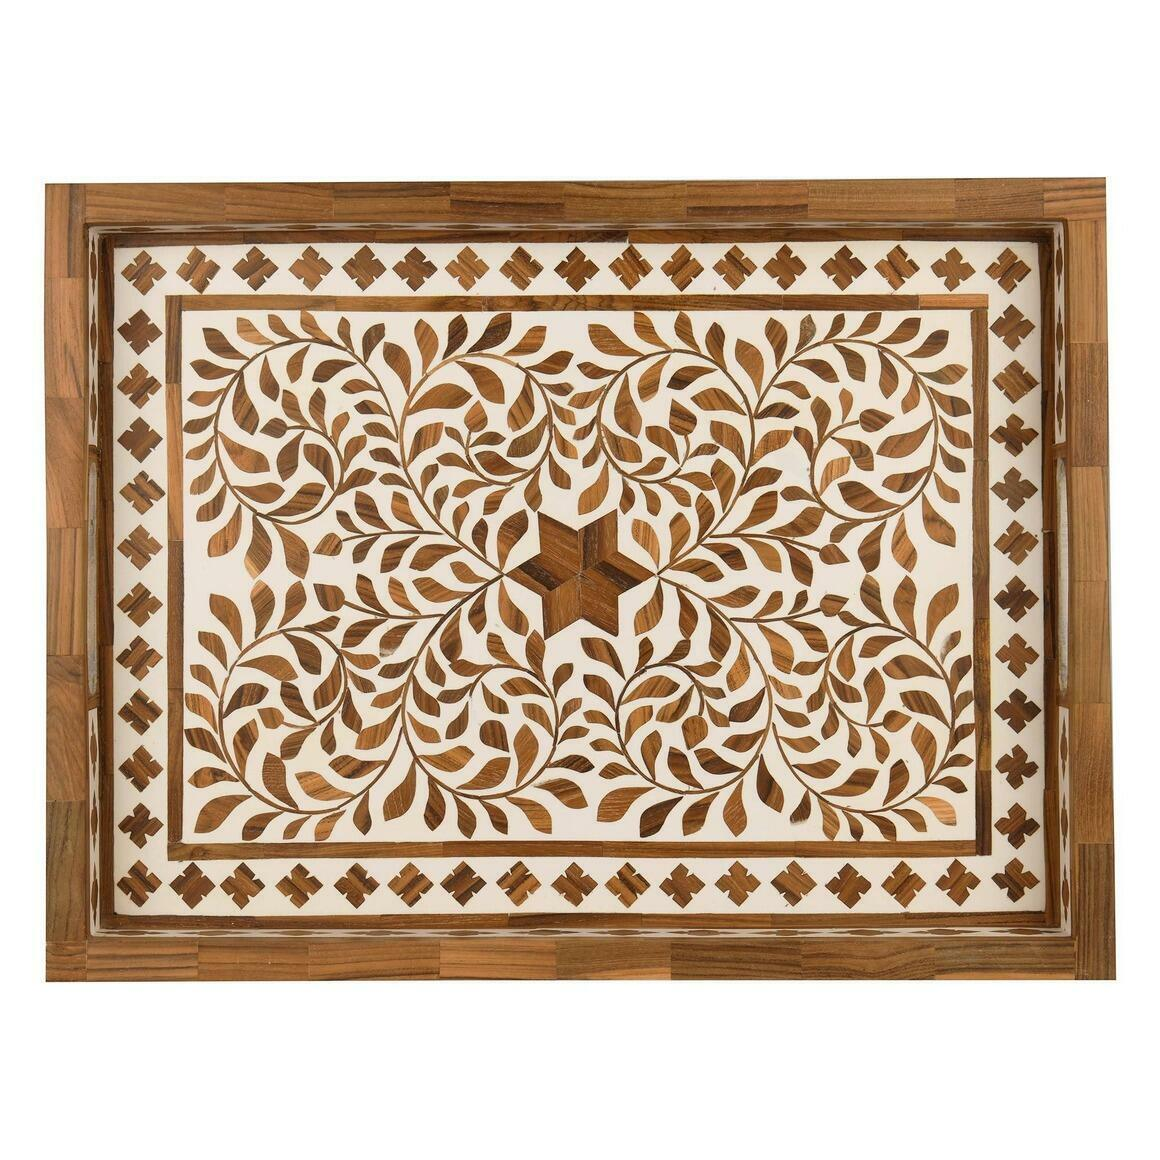 "Jodhpur Wood Inlay Décor Tray in Teak Brown (20""x15"")   Trada Marketplace"